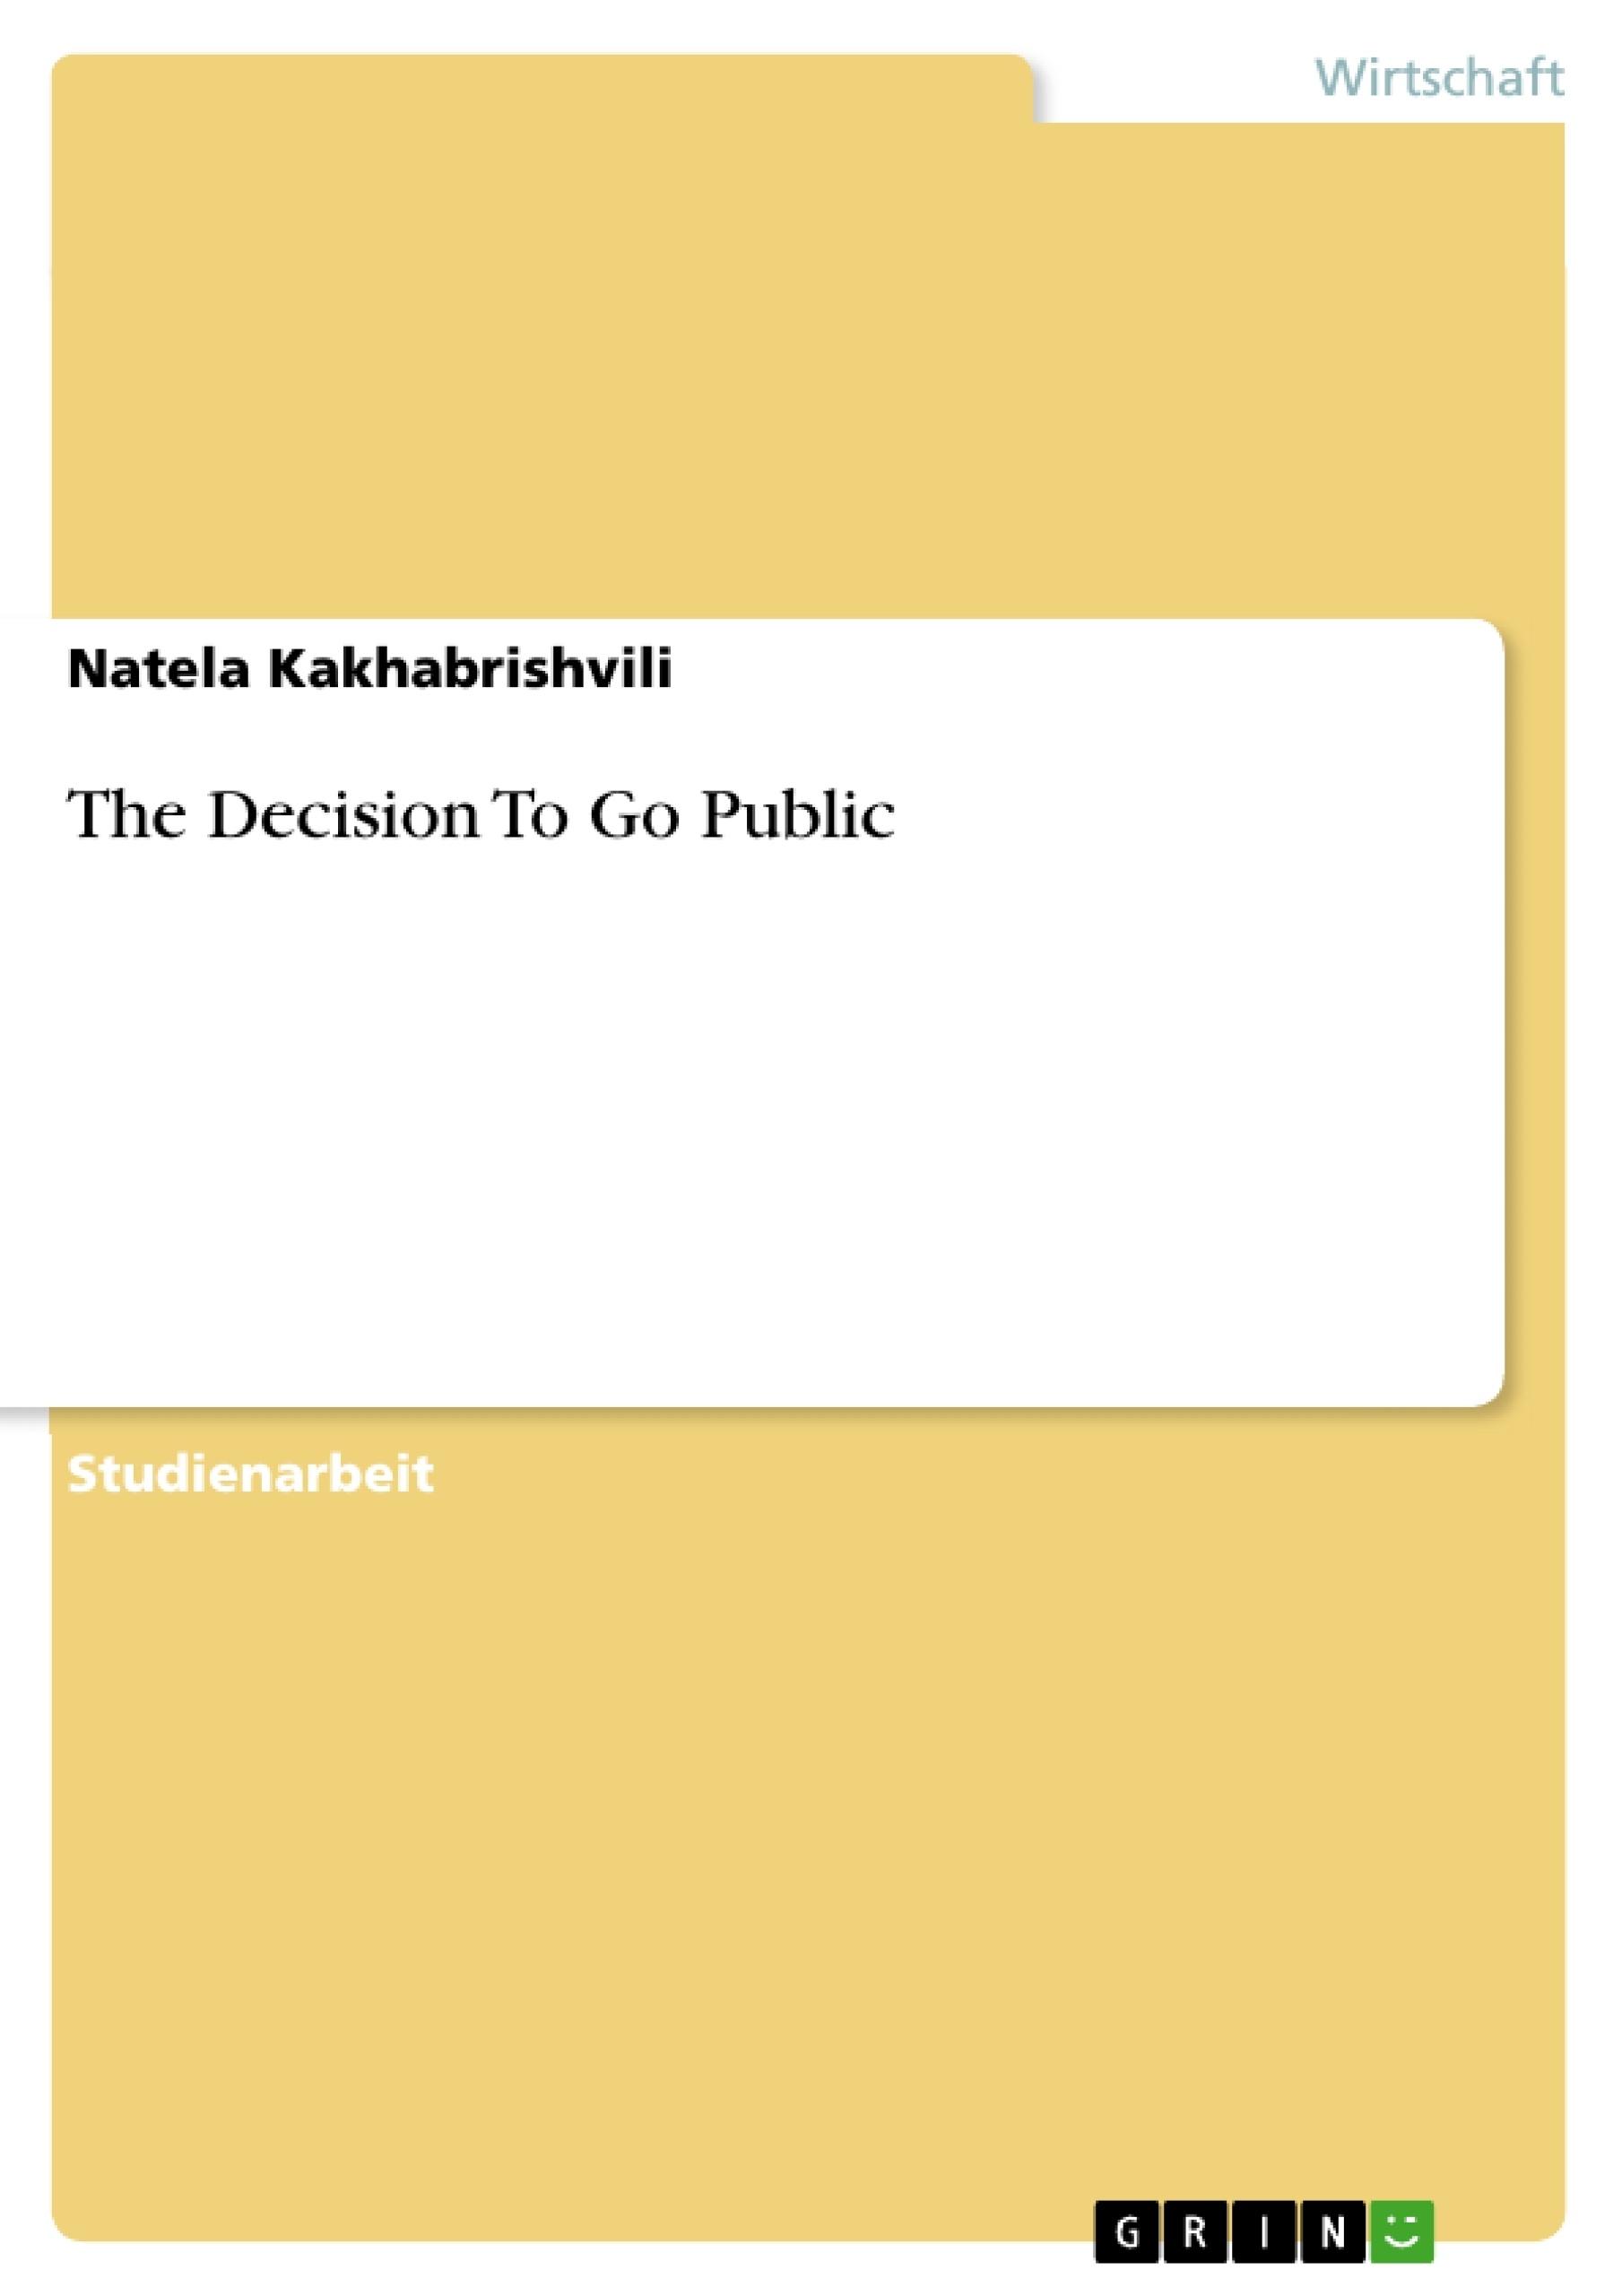 Titel: The Decision To Go Public